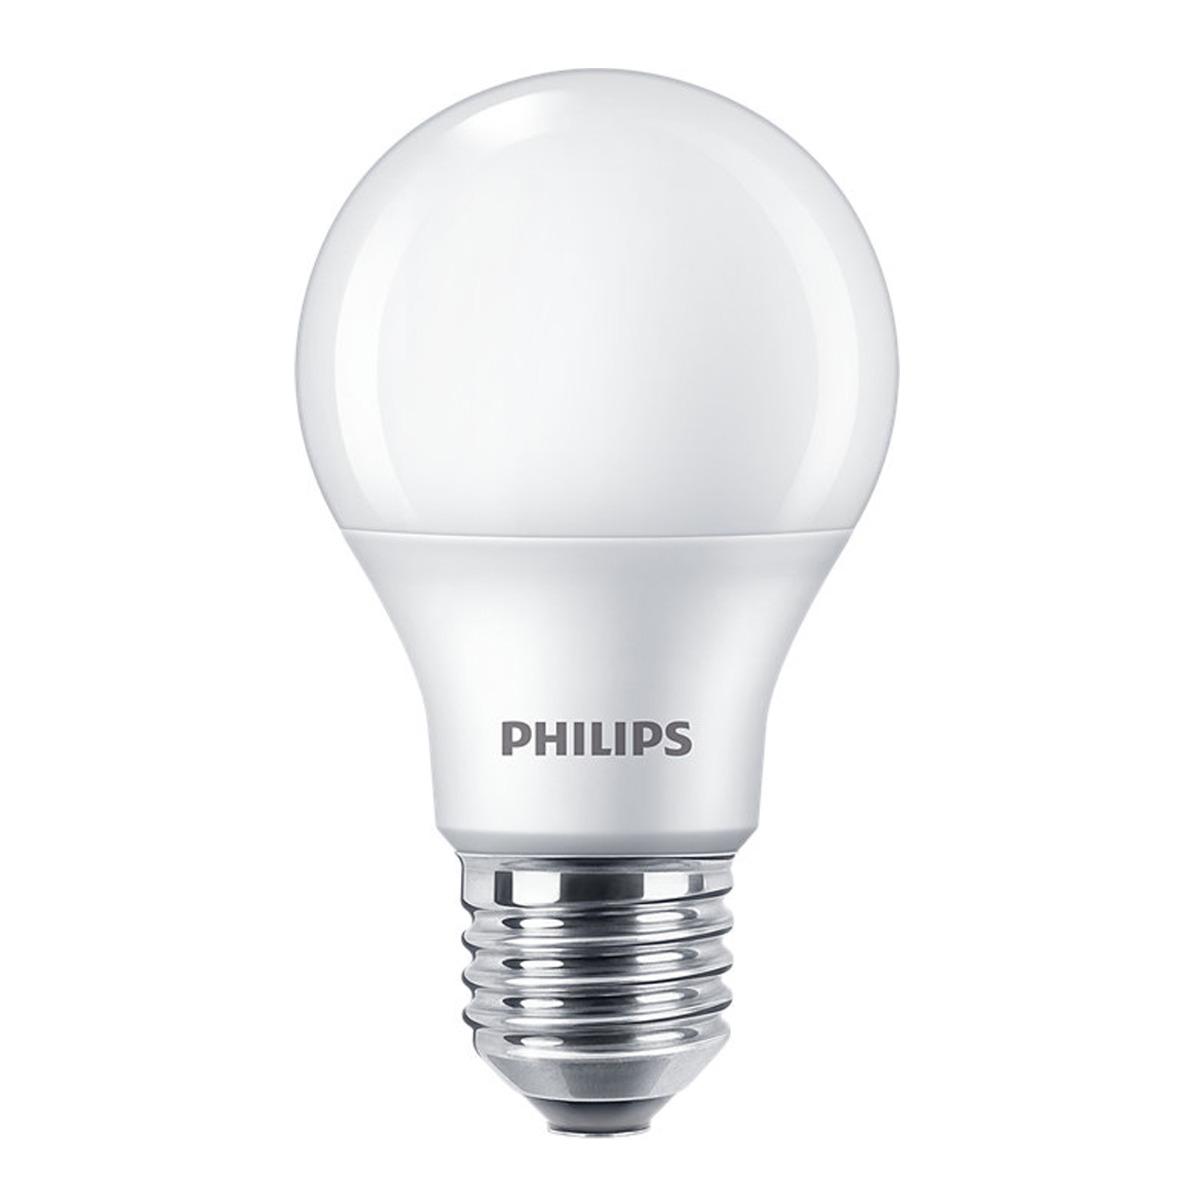 Philips CorePro LEDbulb E27 A60 8.5W 927 Mat | Beste Kleurweergave - Zeer Warm Wit - Dimbaar - Vervangt 60W